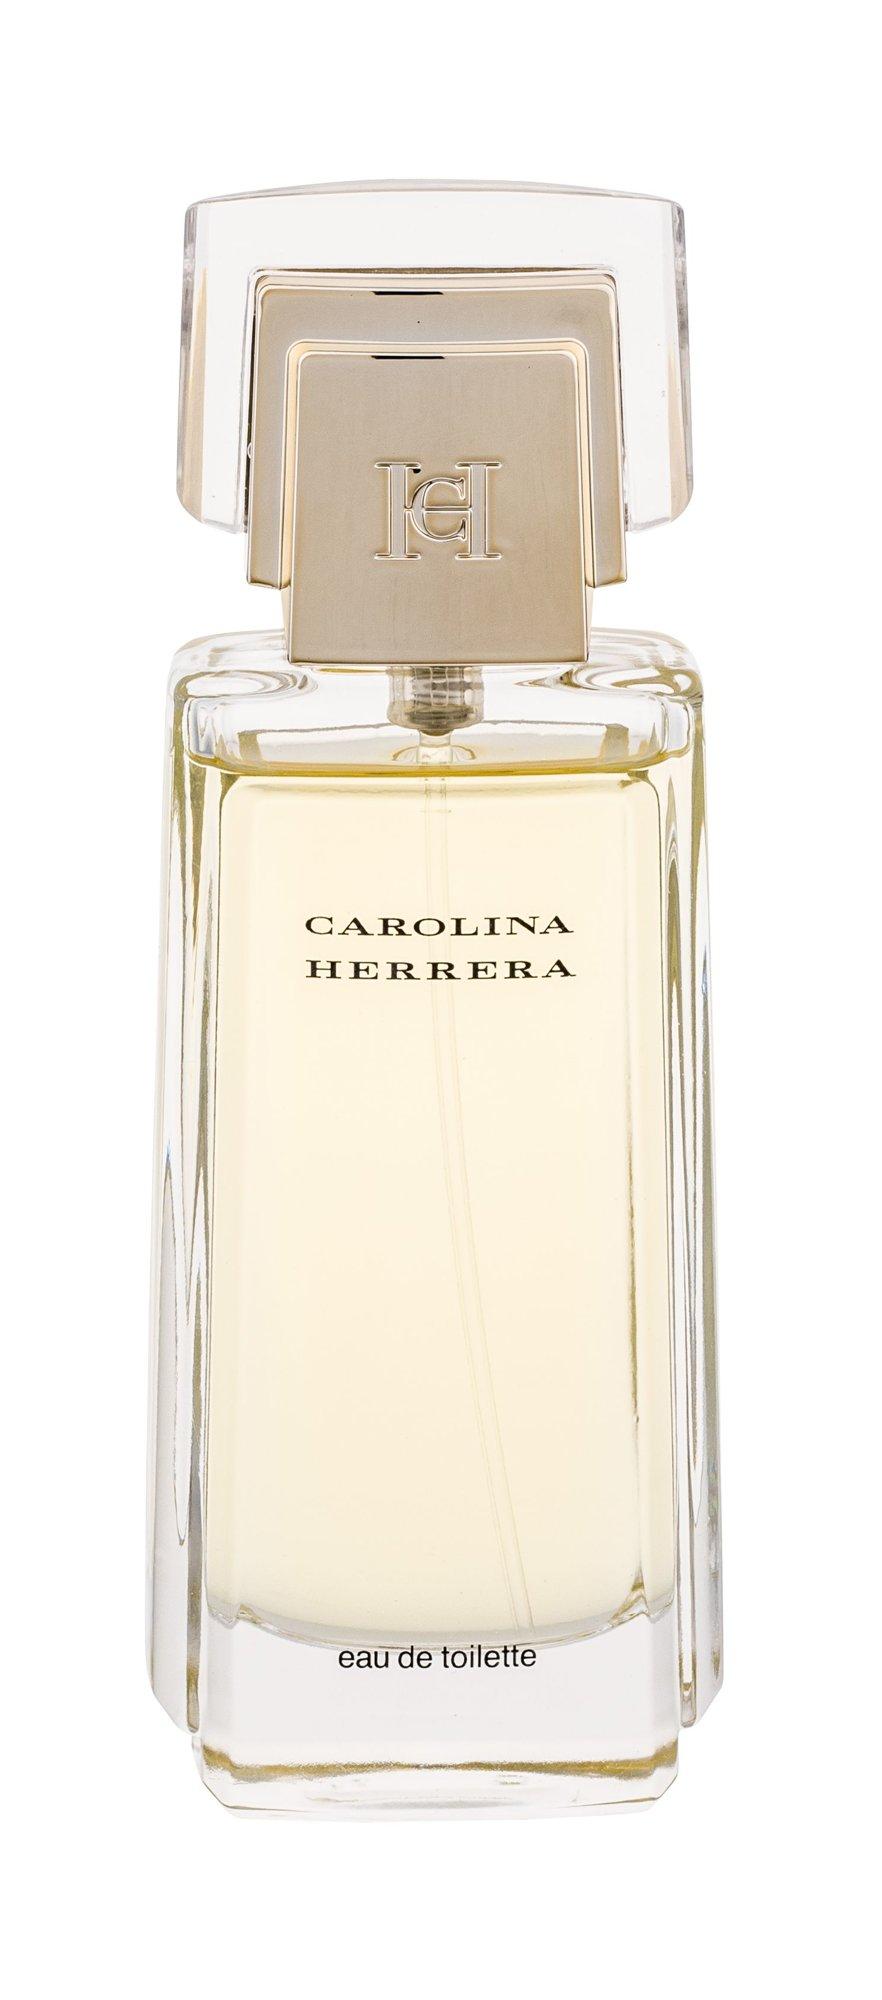 Carolina Herrera Carolina Herrera EDT 50ml